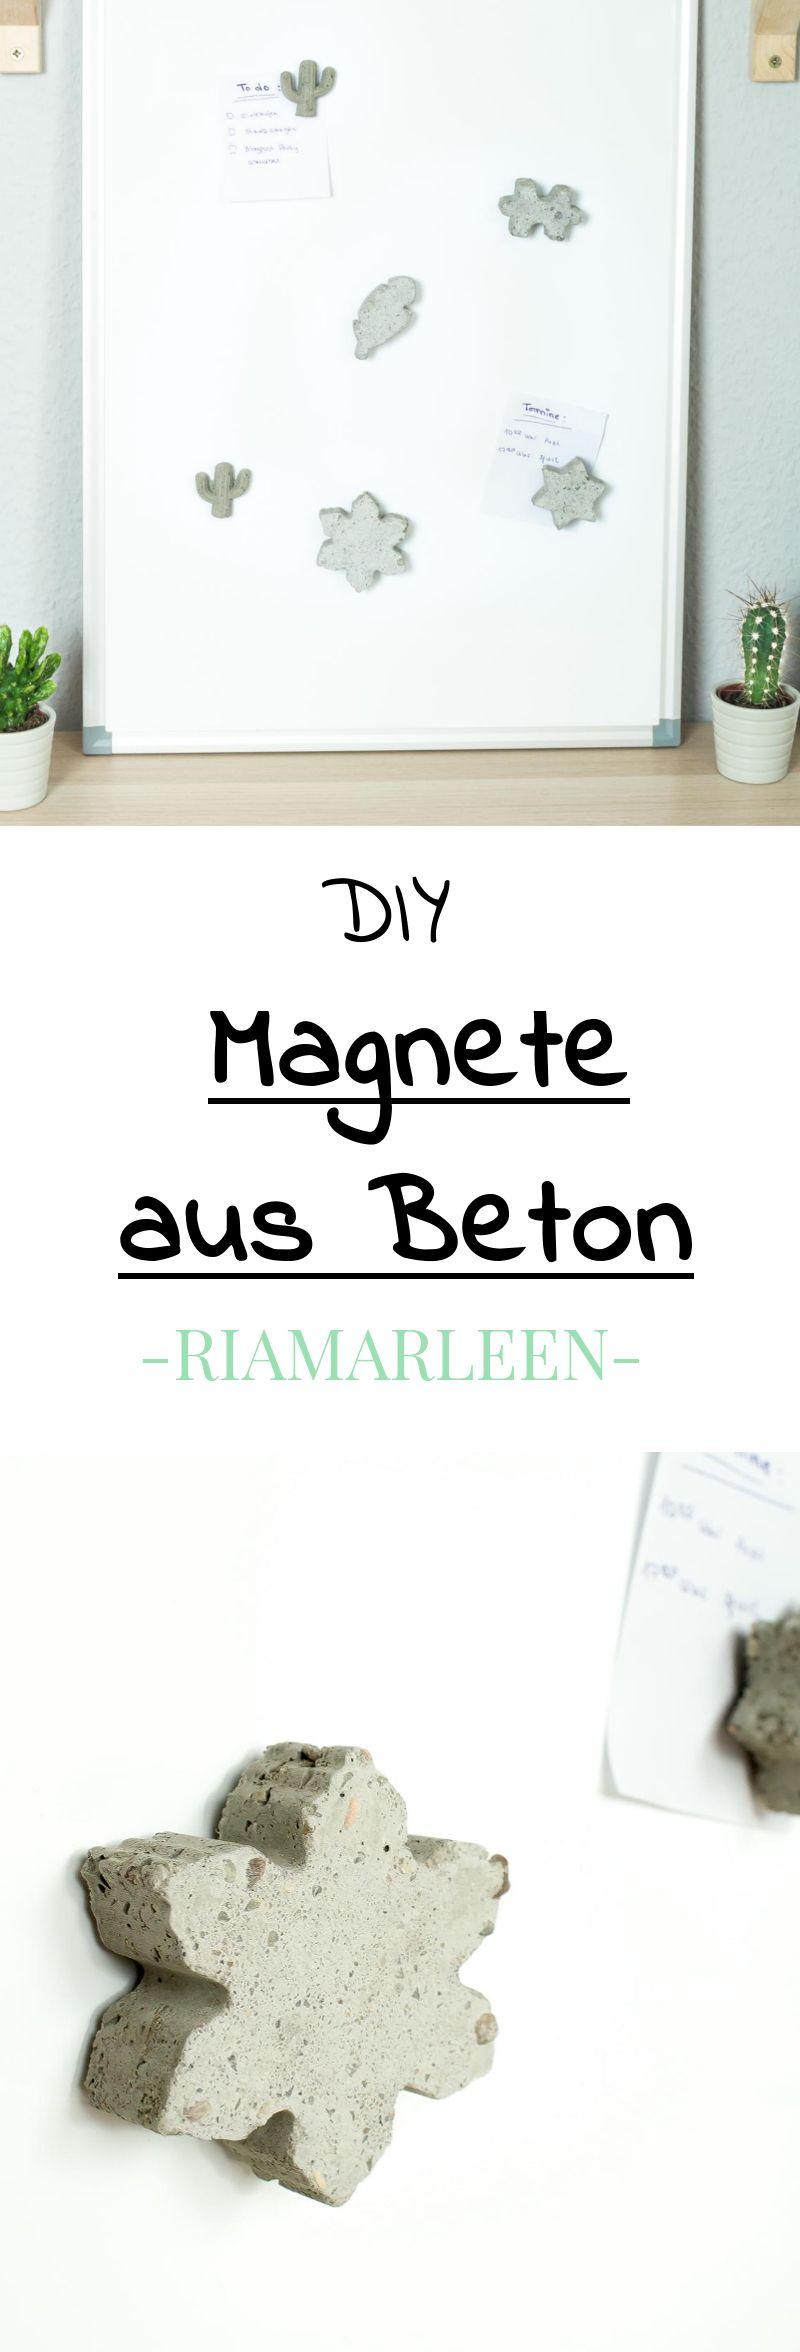 diy idee individuelle magnete aus beton basteln schmuck diy diy magnets und how to make. Black Bedroom Furniture Sets. Home Design Ideas